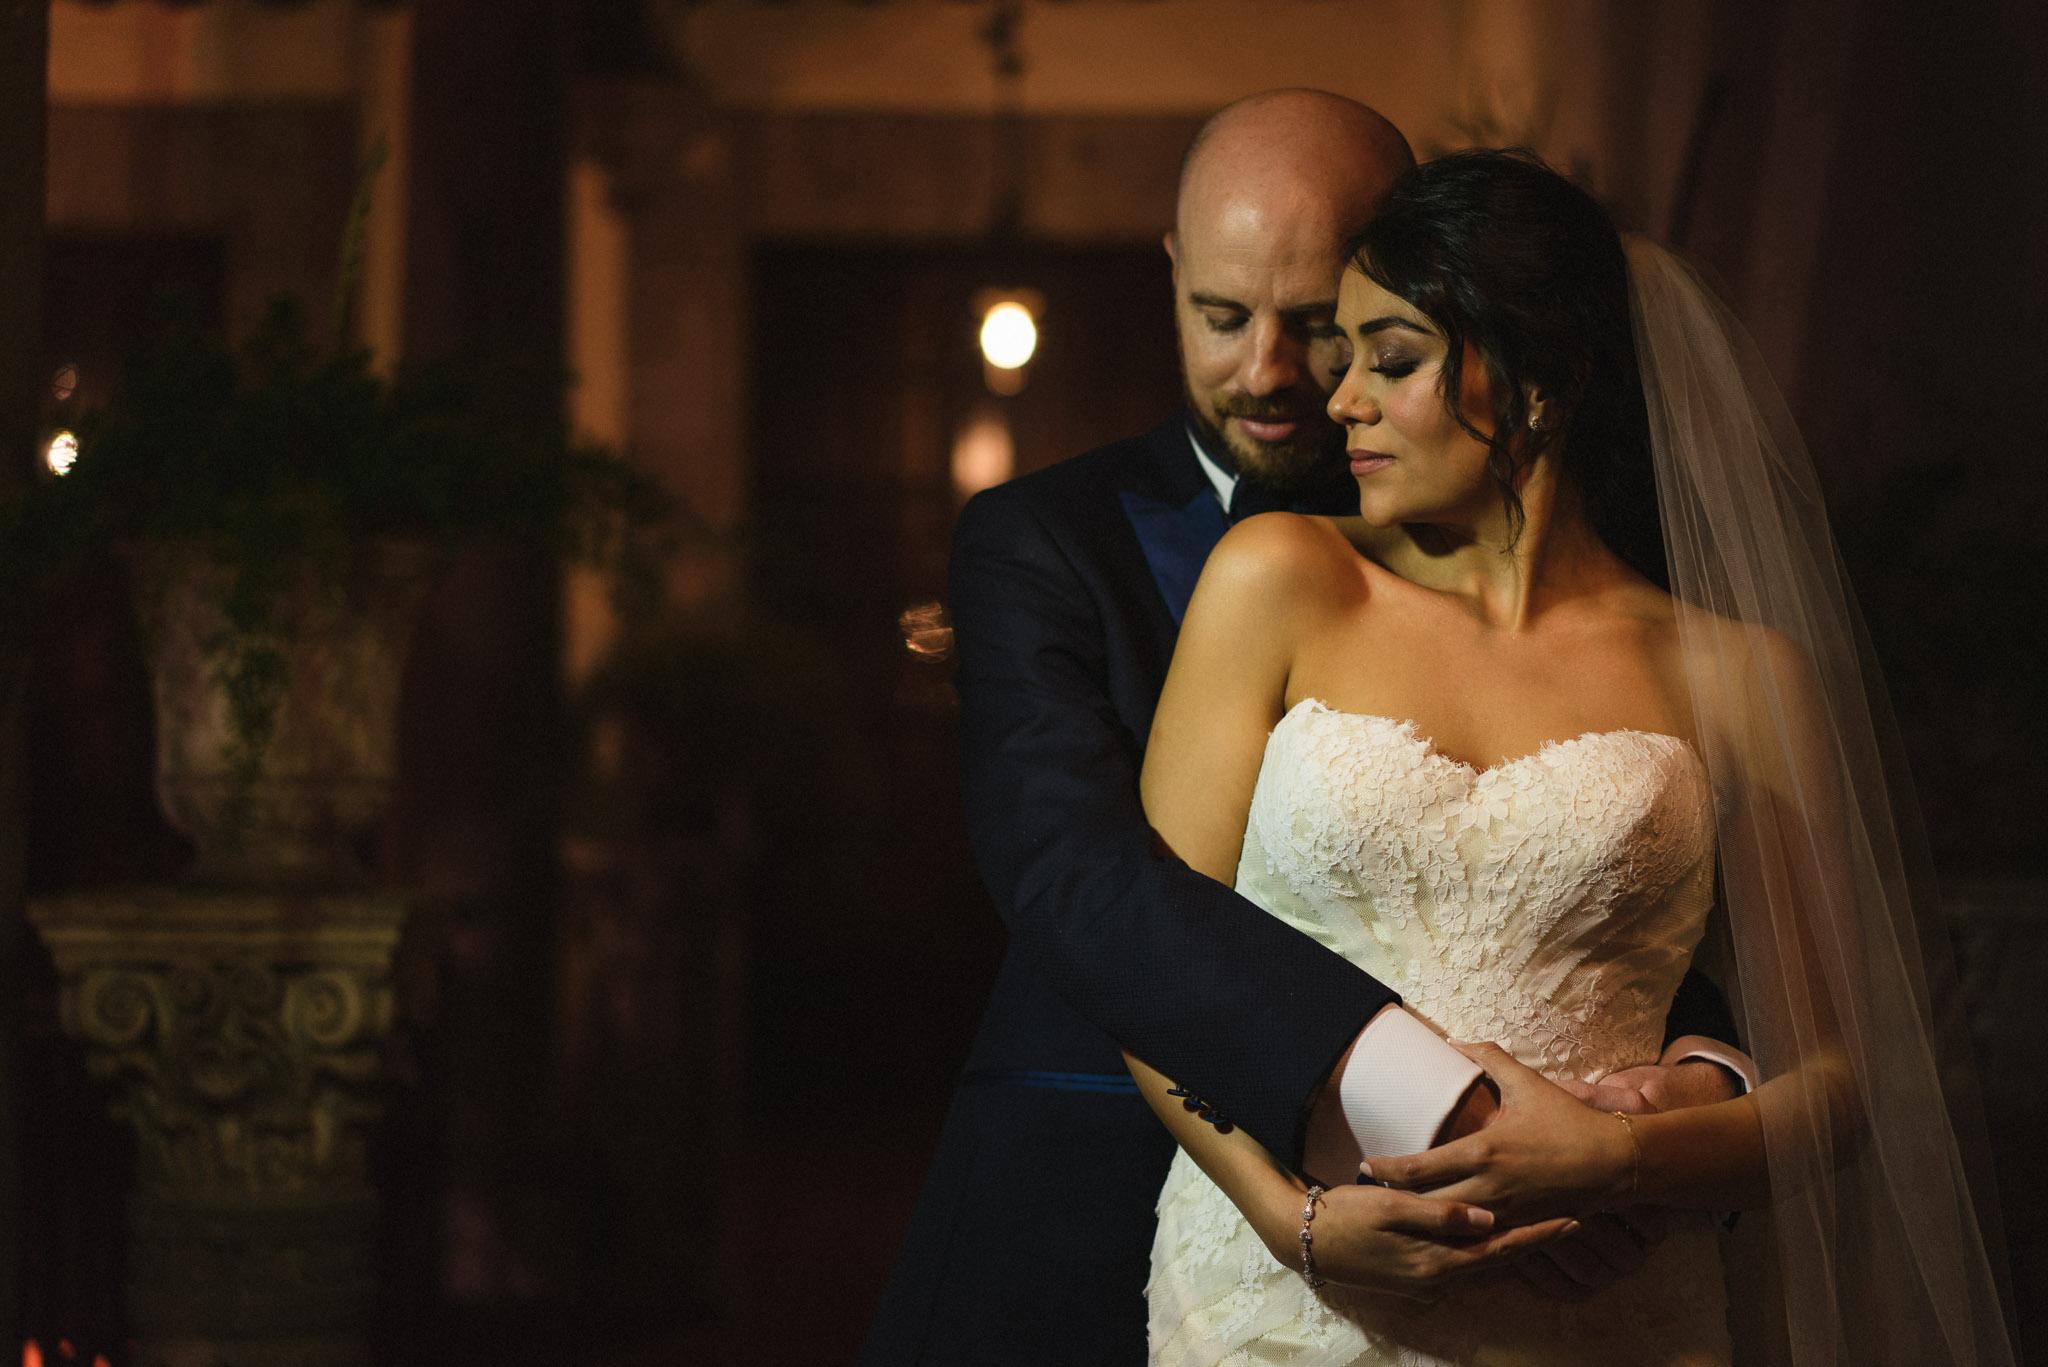 ©www.mauriziosolisbroca.com-20161001maurizio-solis-broca-mexico-canada-wedding-photographer20161001DSC05196-Edit.jpg